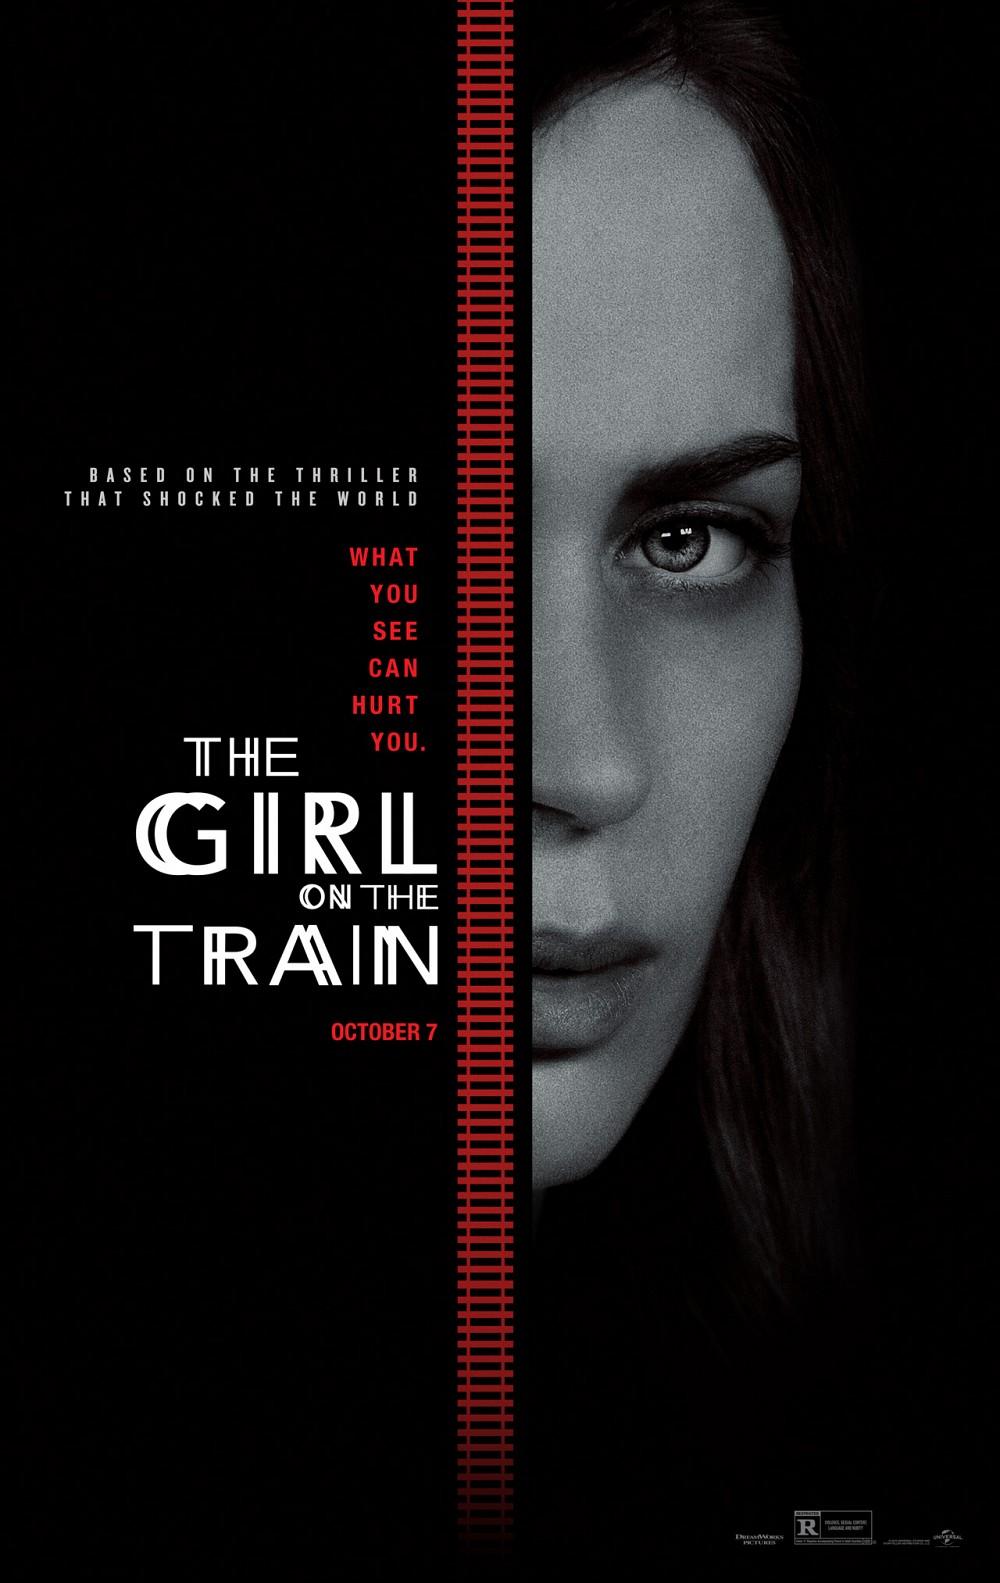 The Girl on the Train MovieSpoon.com